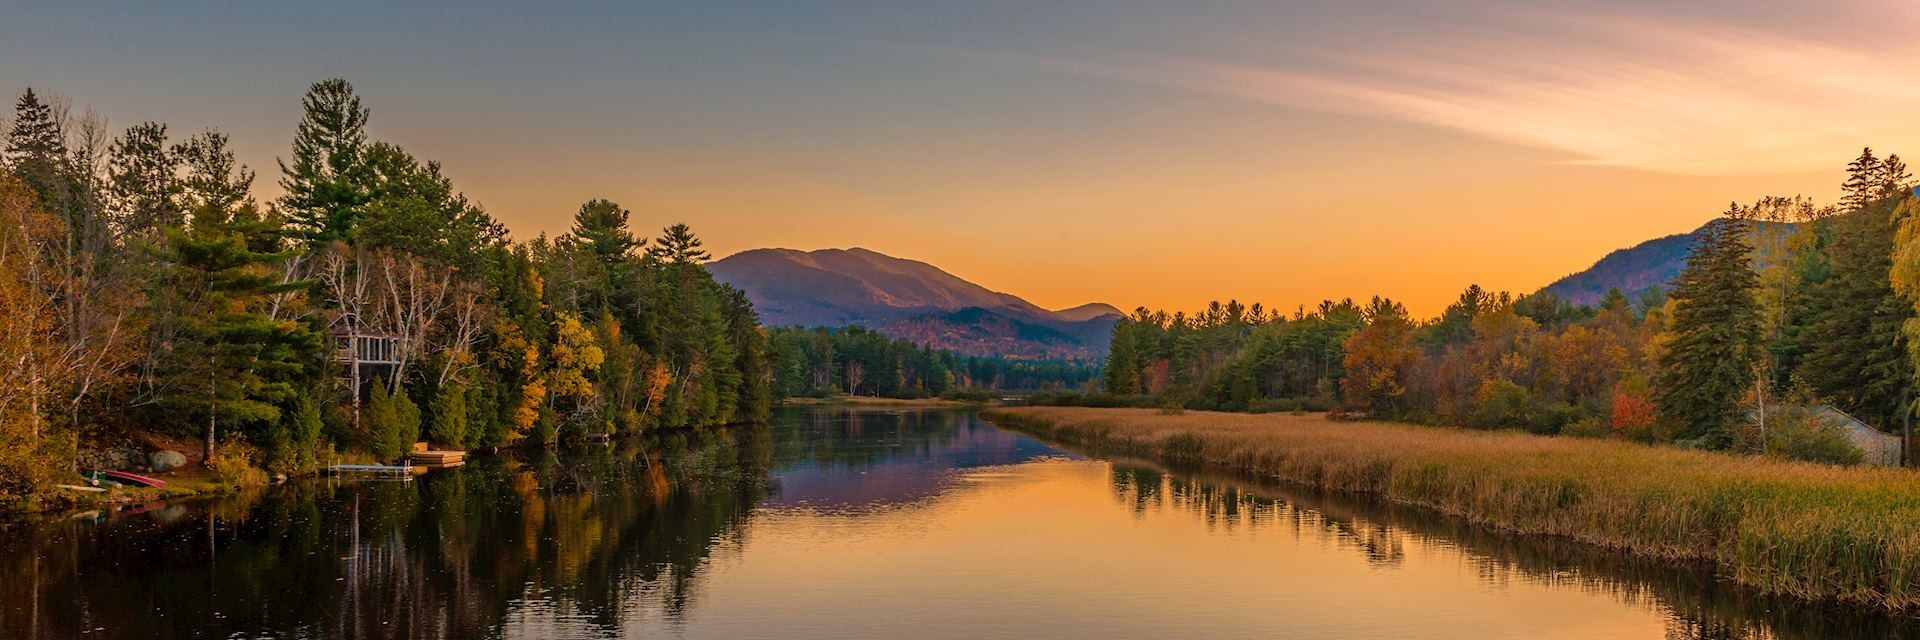 Sunset on Lake Placid